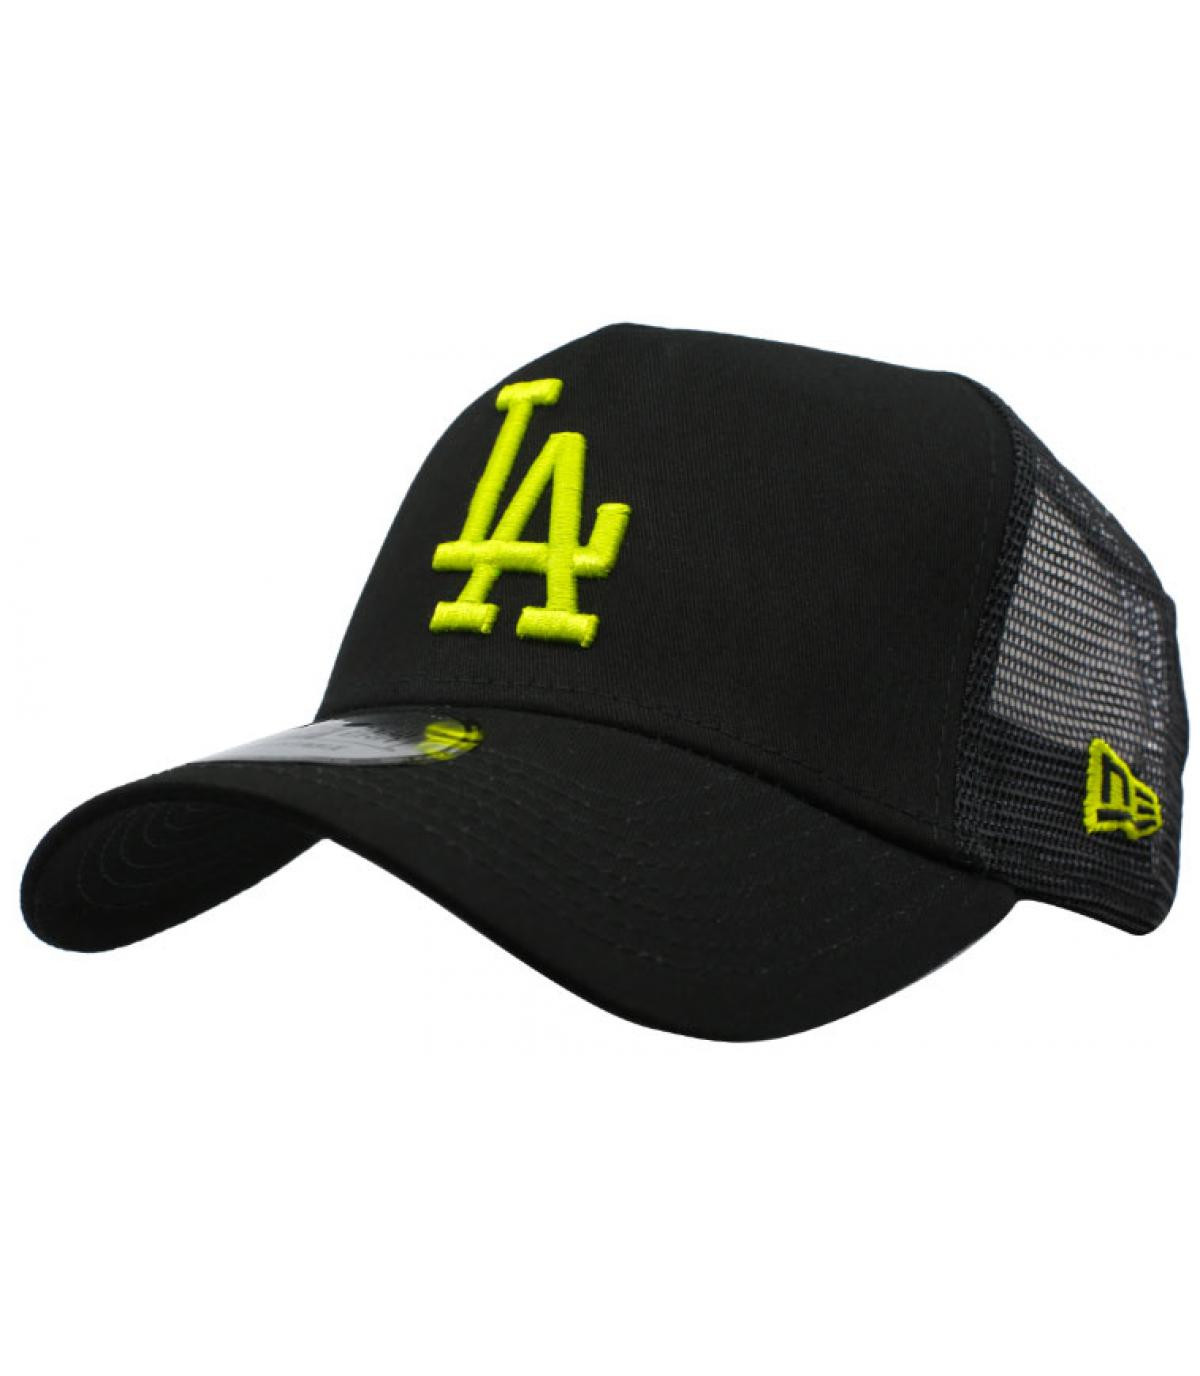 black yellow LA trucker